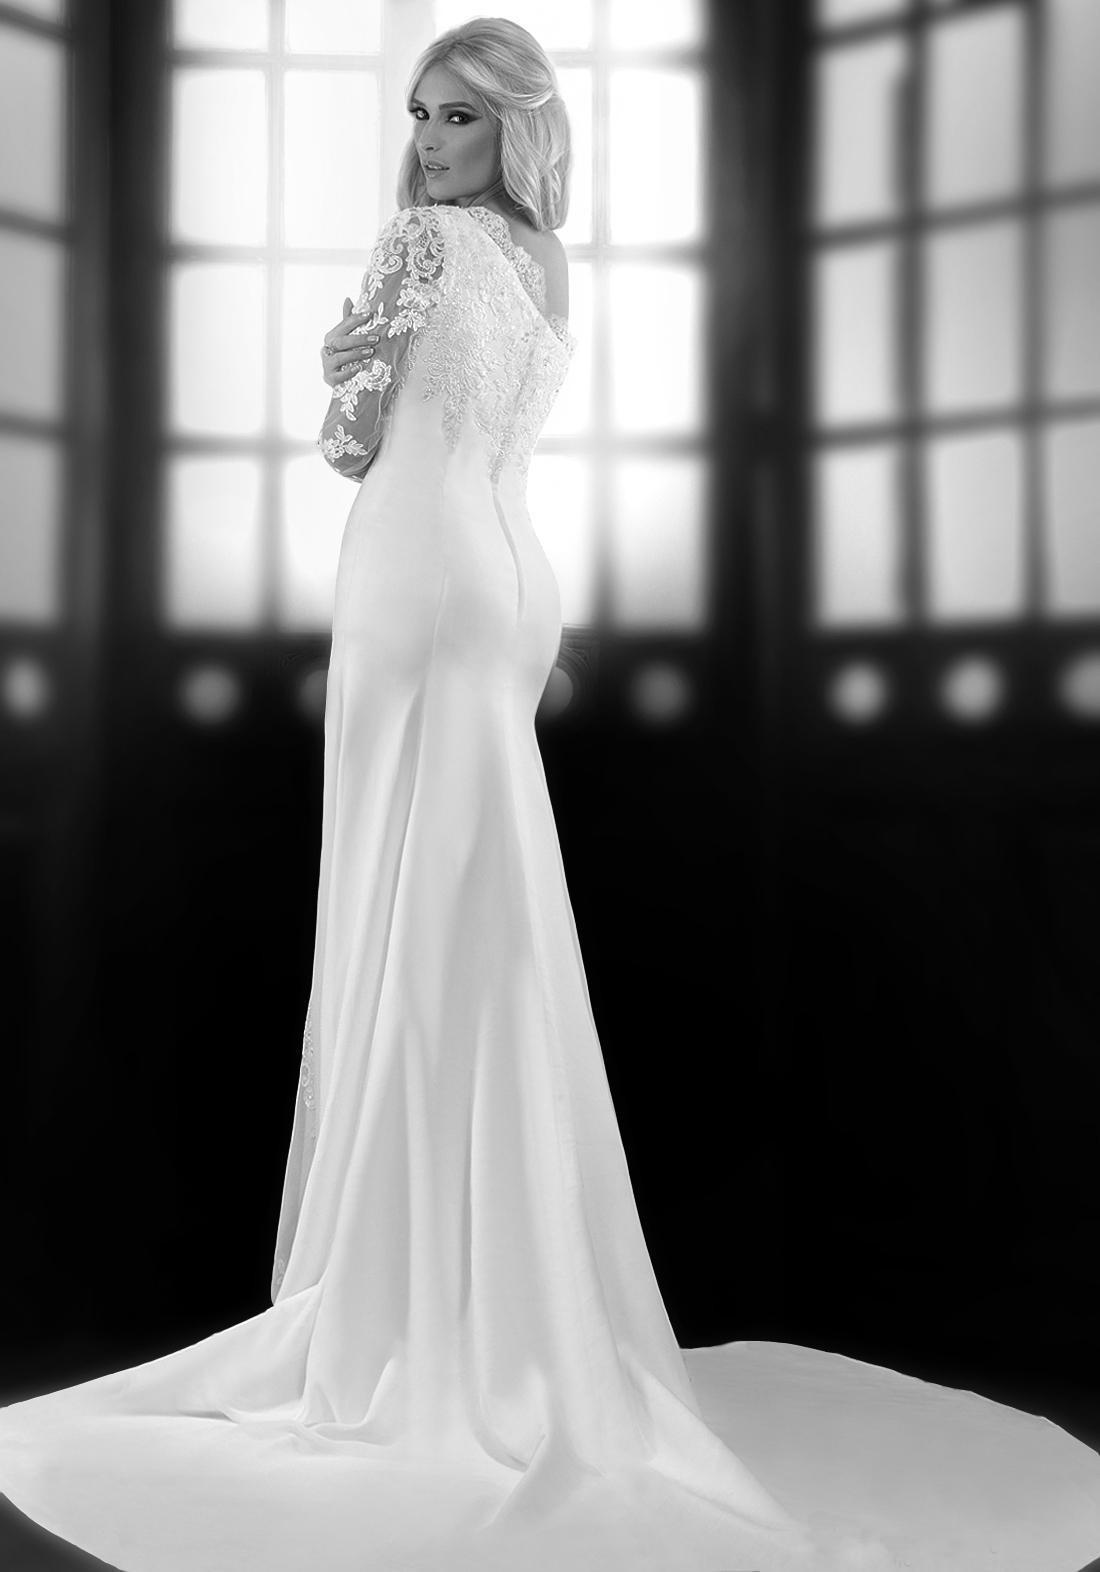 Dramatic One Sheer Long Sleeve Wedding Dresses High Side Split